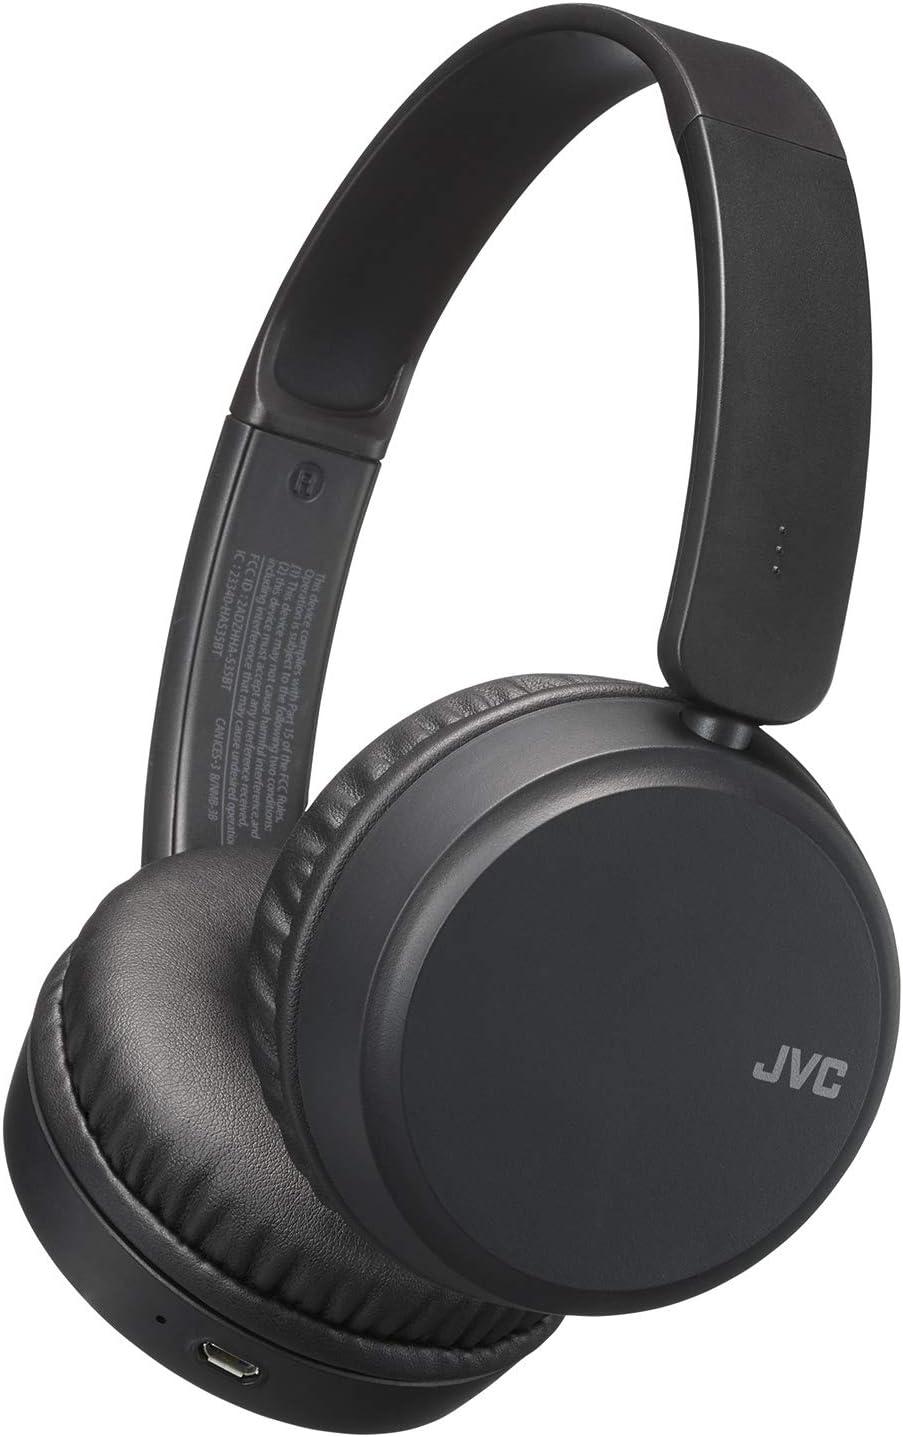 JVC Deep Bass Wireless Headphones, Bluetooth 4.1, Bass Boost Function, Voice Assistant Compatible, 17 Hour Battery Life - HAS35BTB(Black)